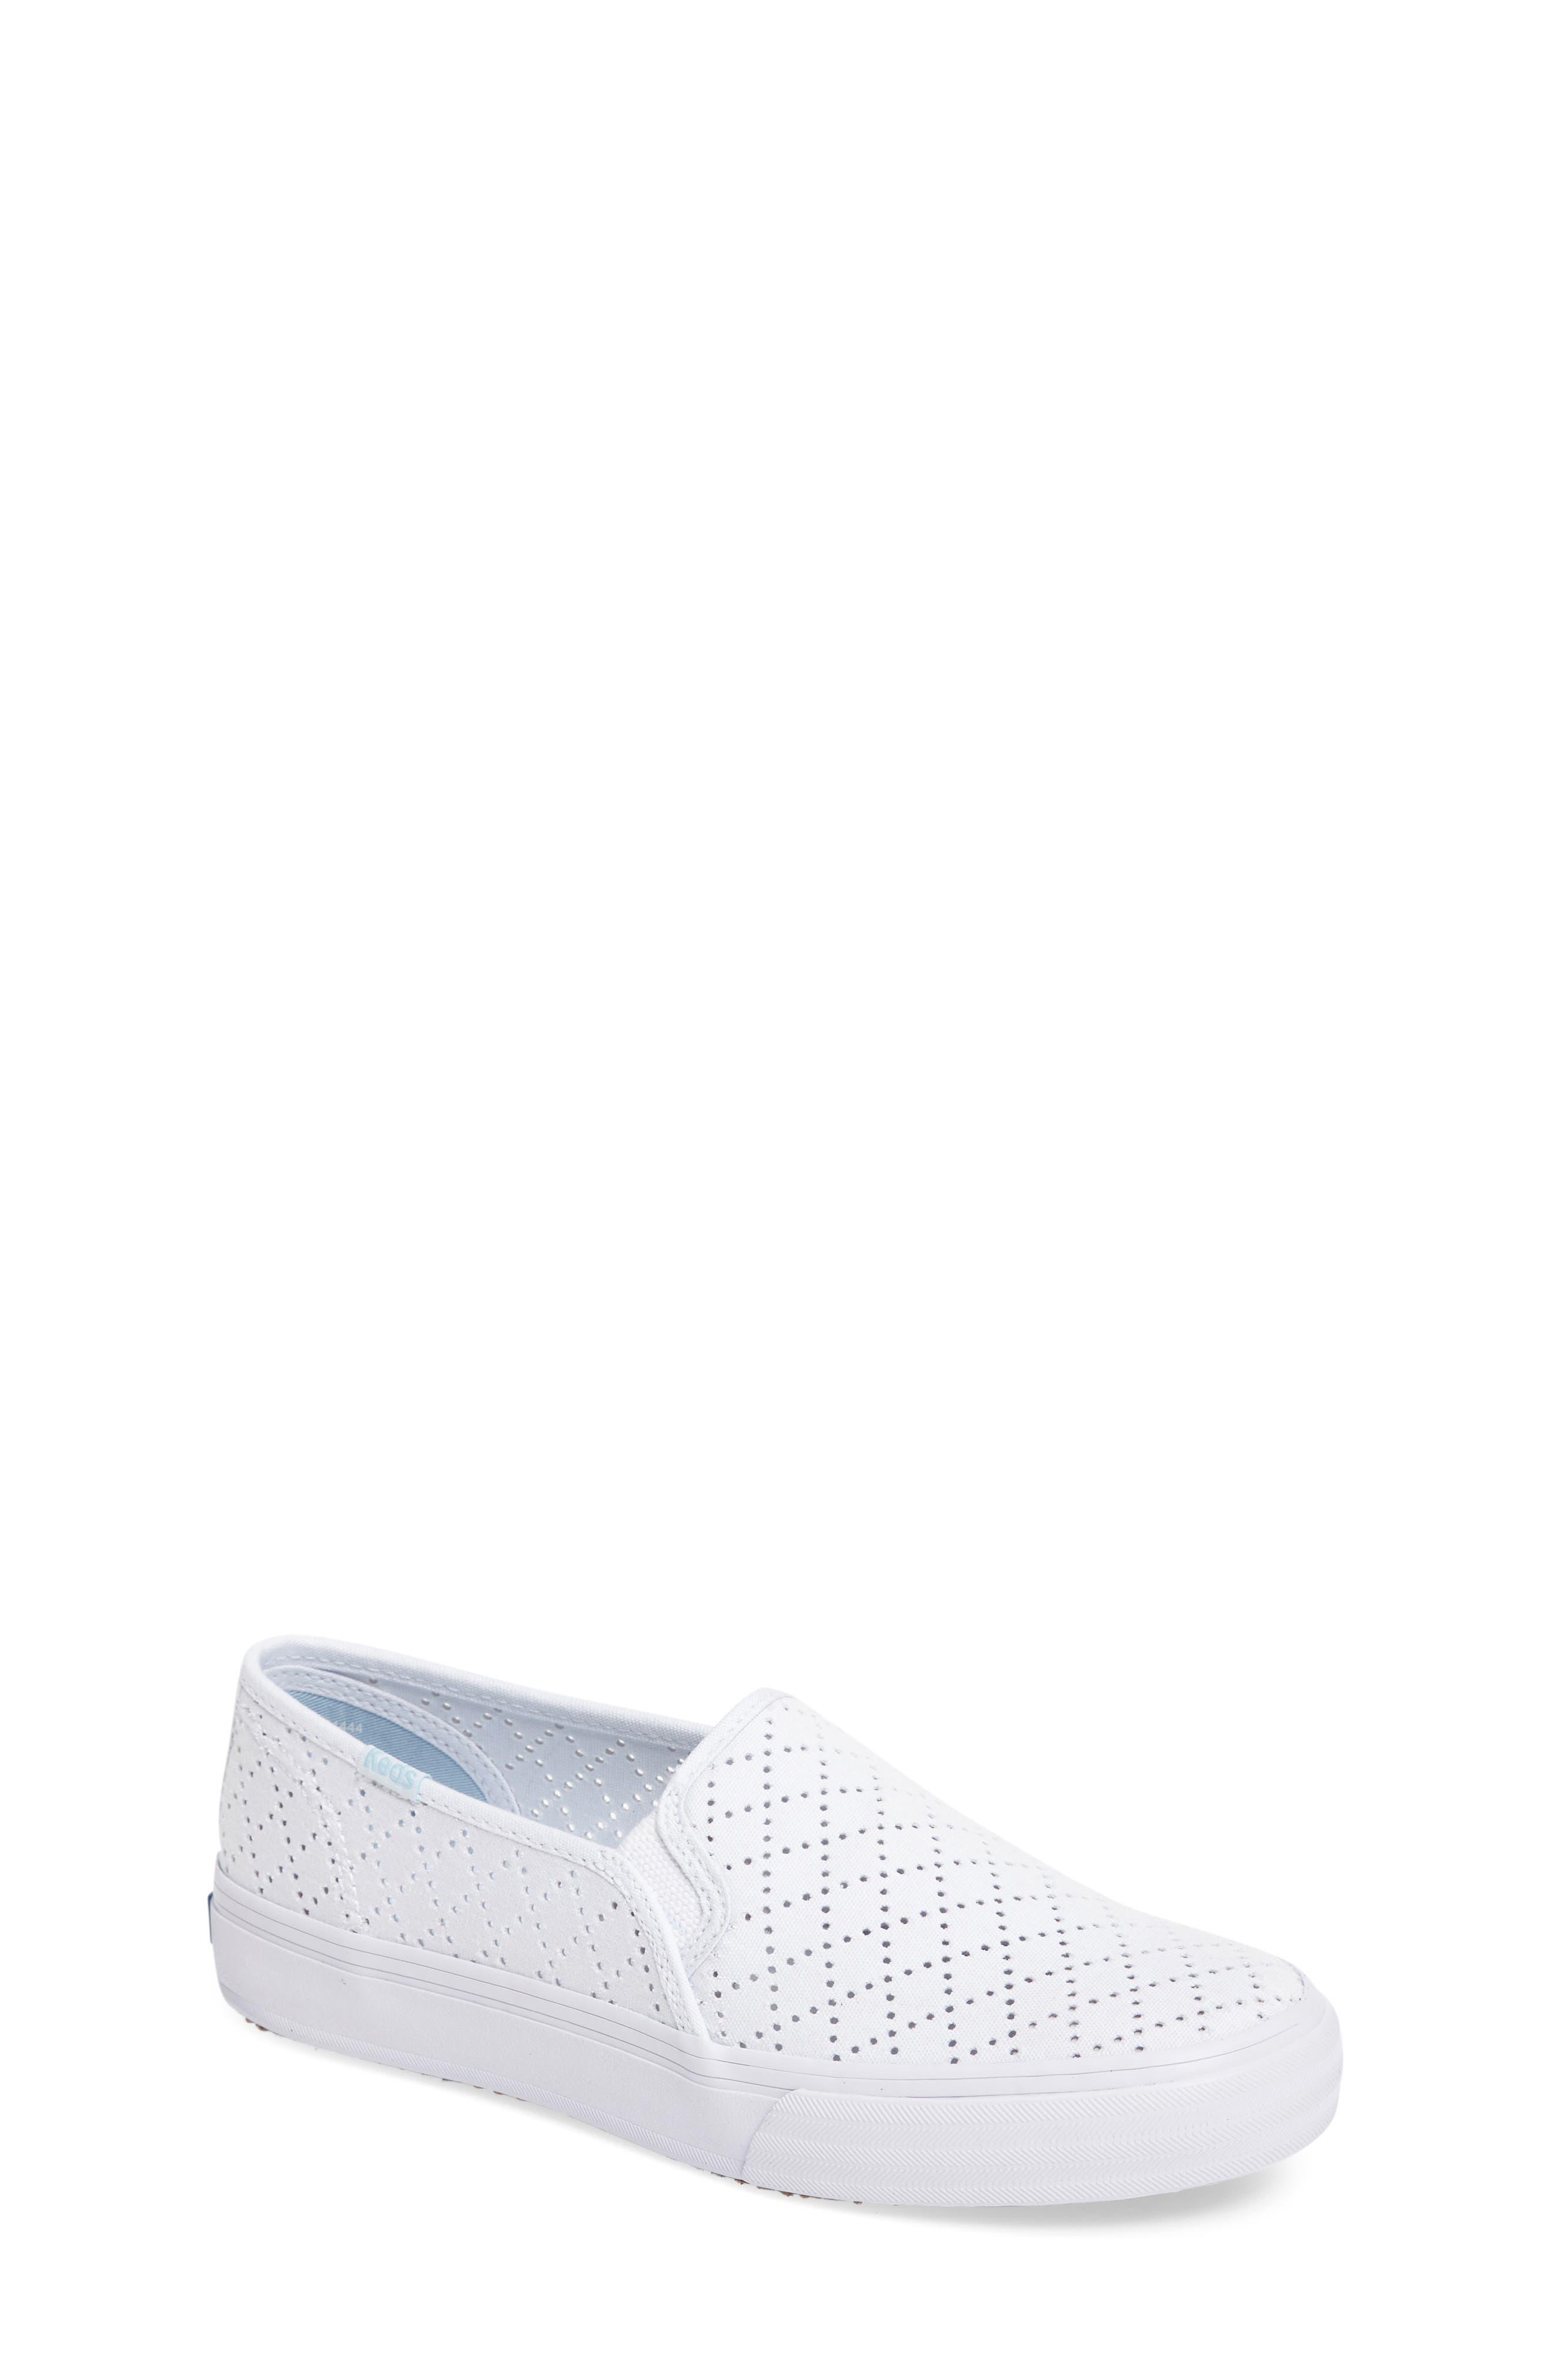 Main Image - Keds® 'Double Decker' Slip-On Sneaker (Women)